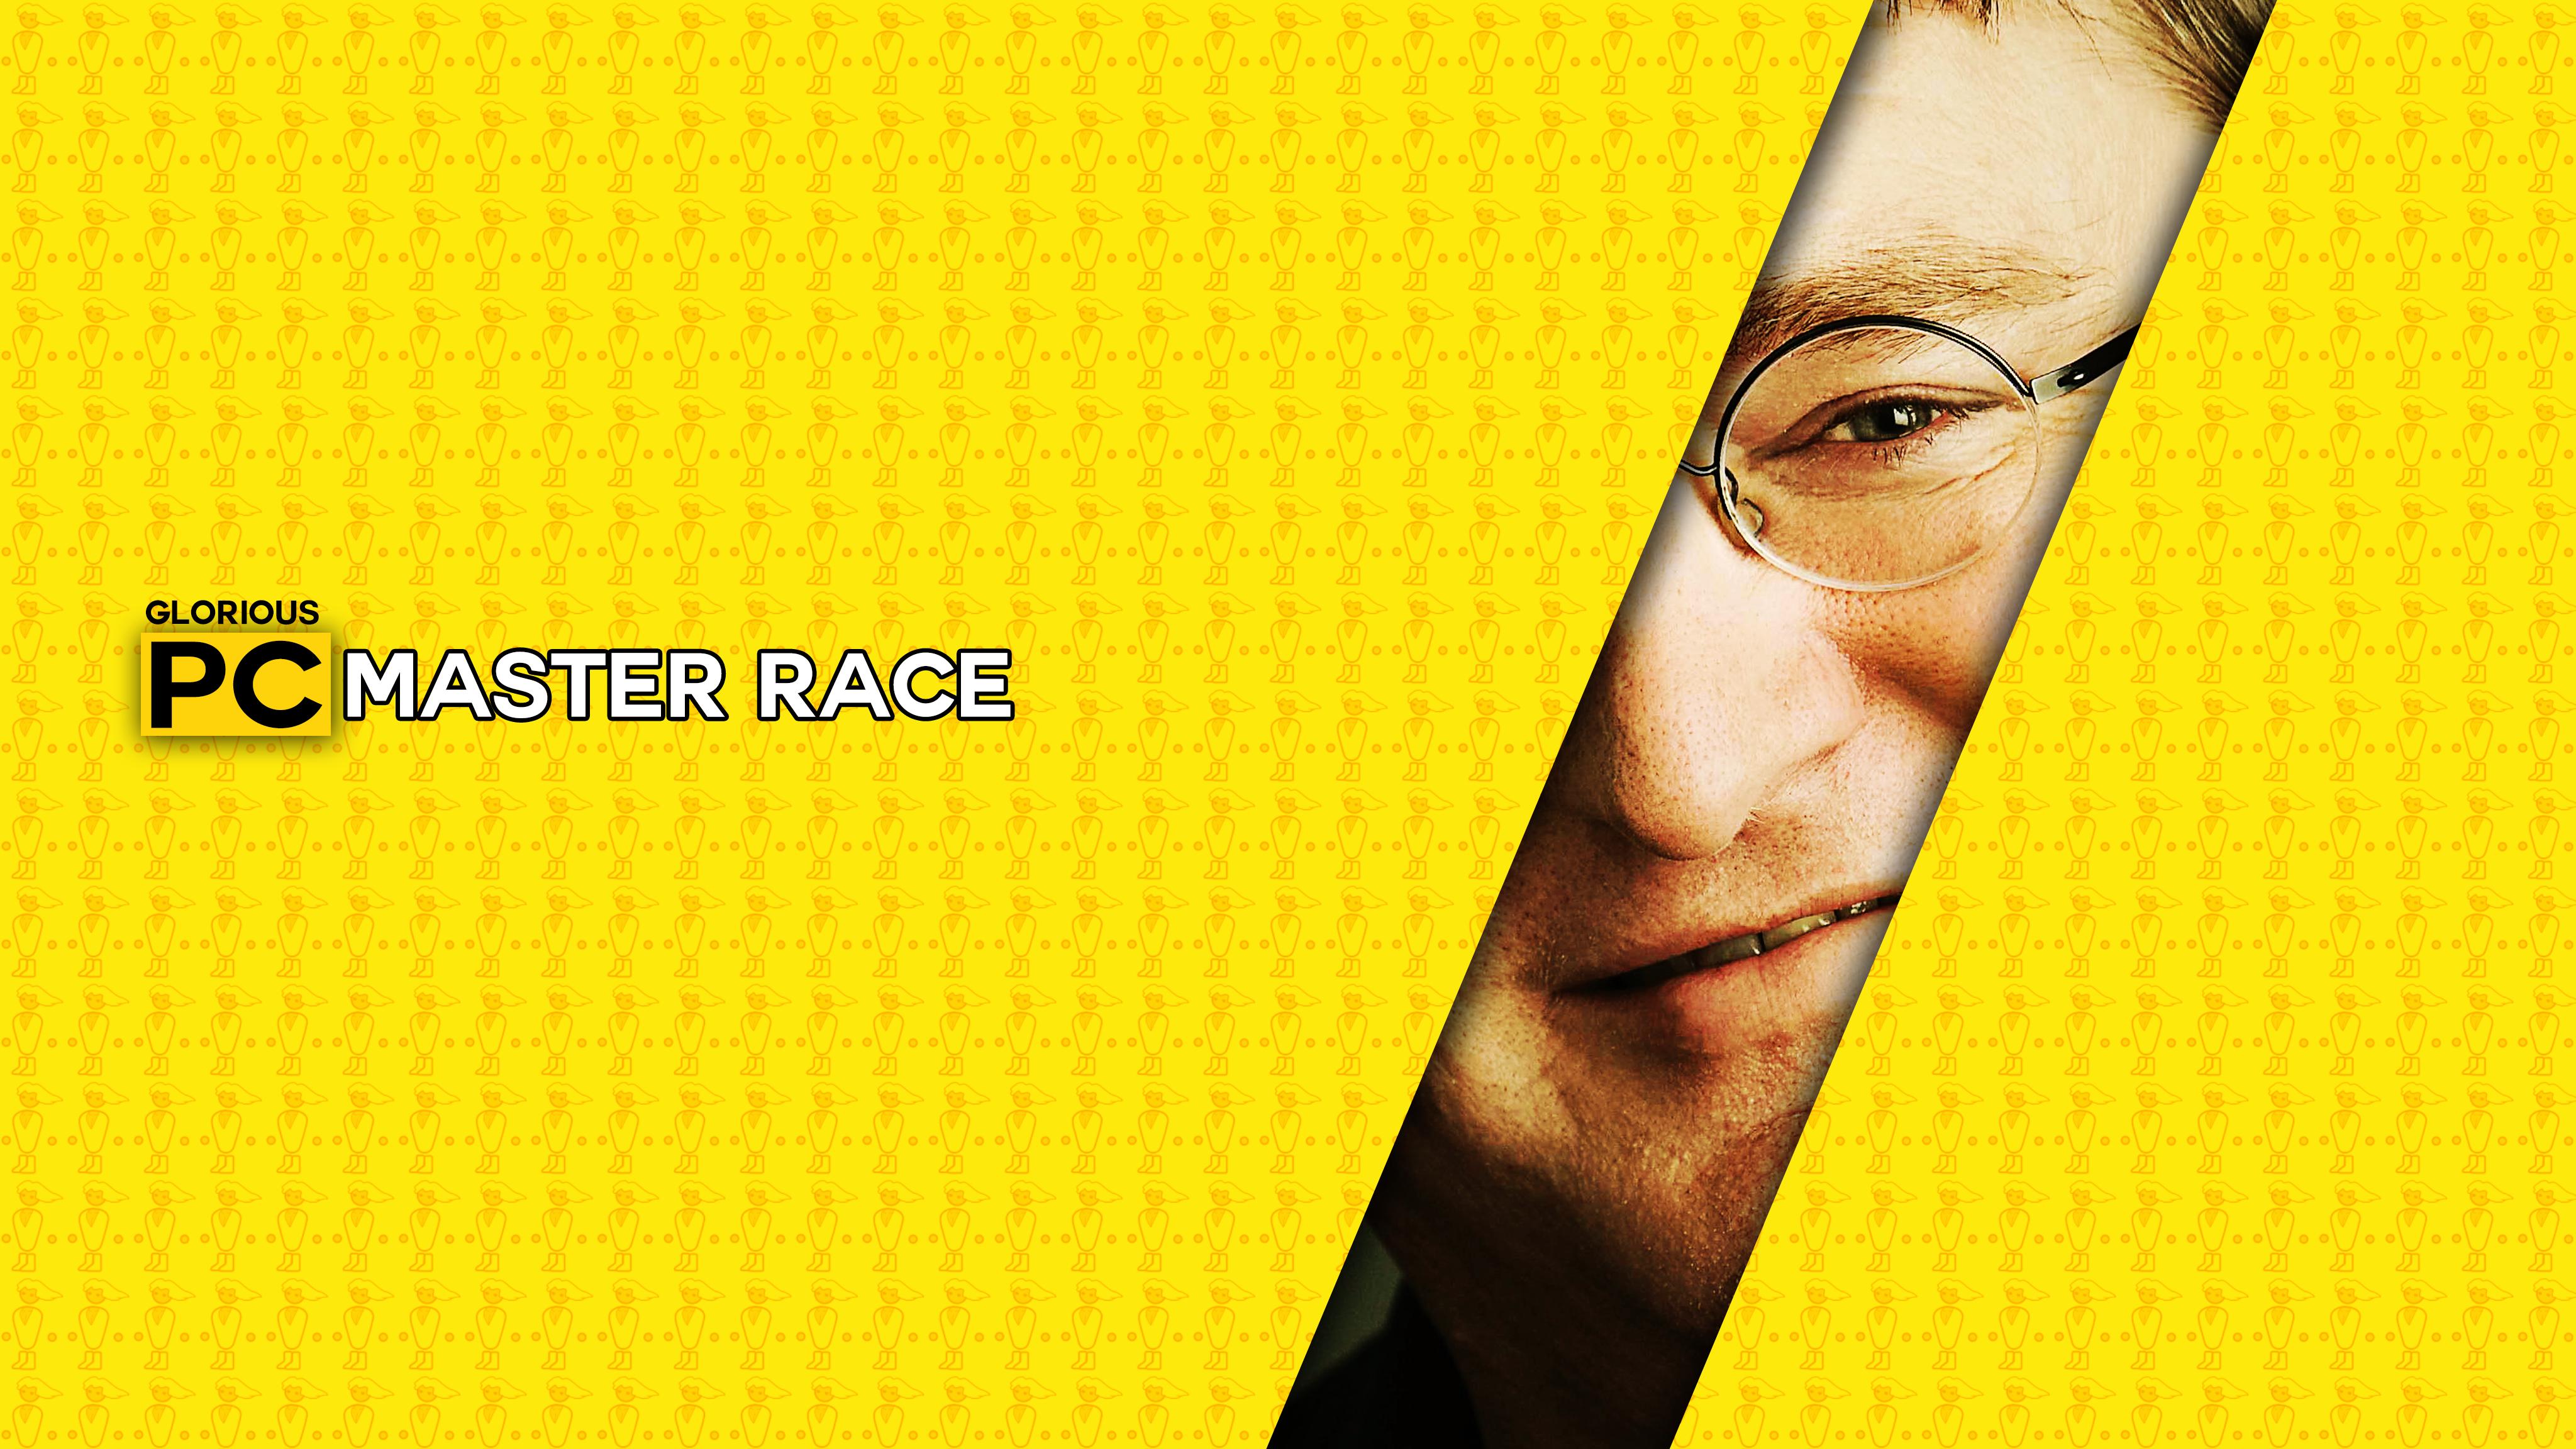 Pc Master Race 4k Ultra Hd Wallpaper Background Image